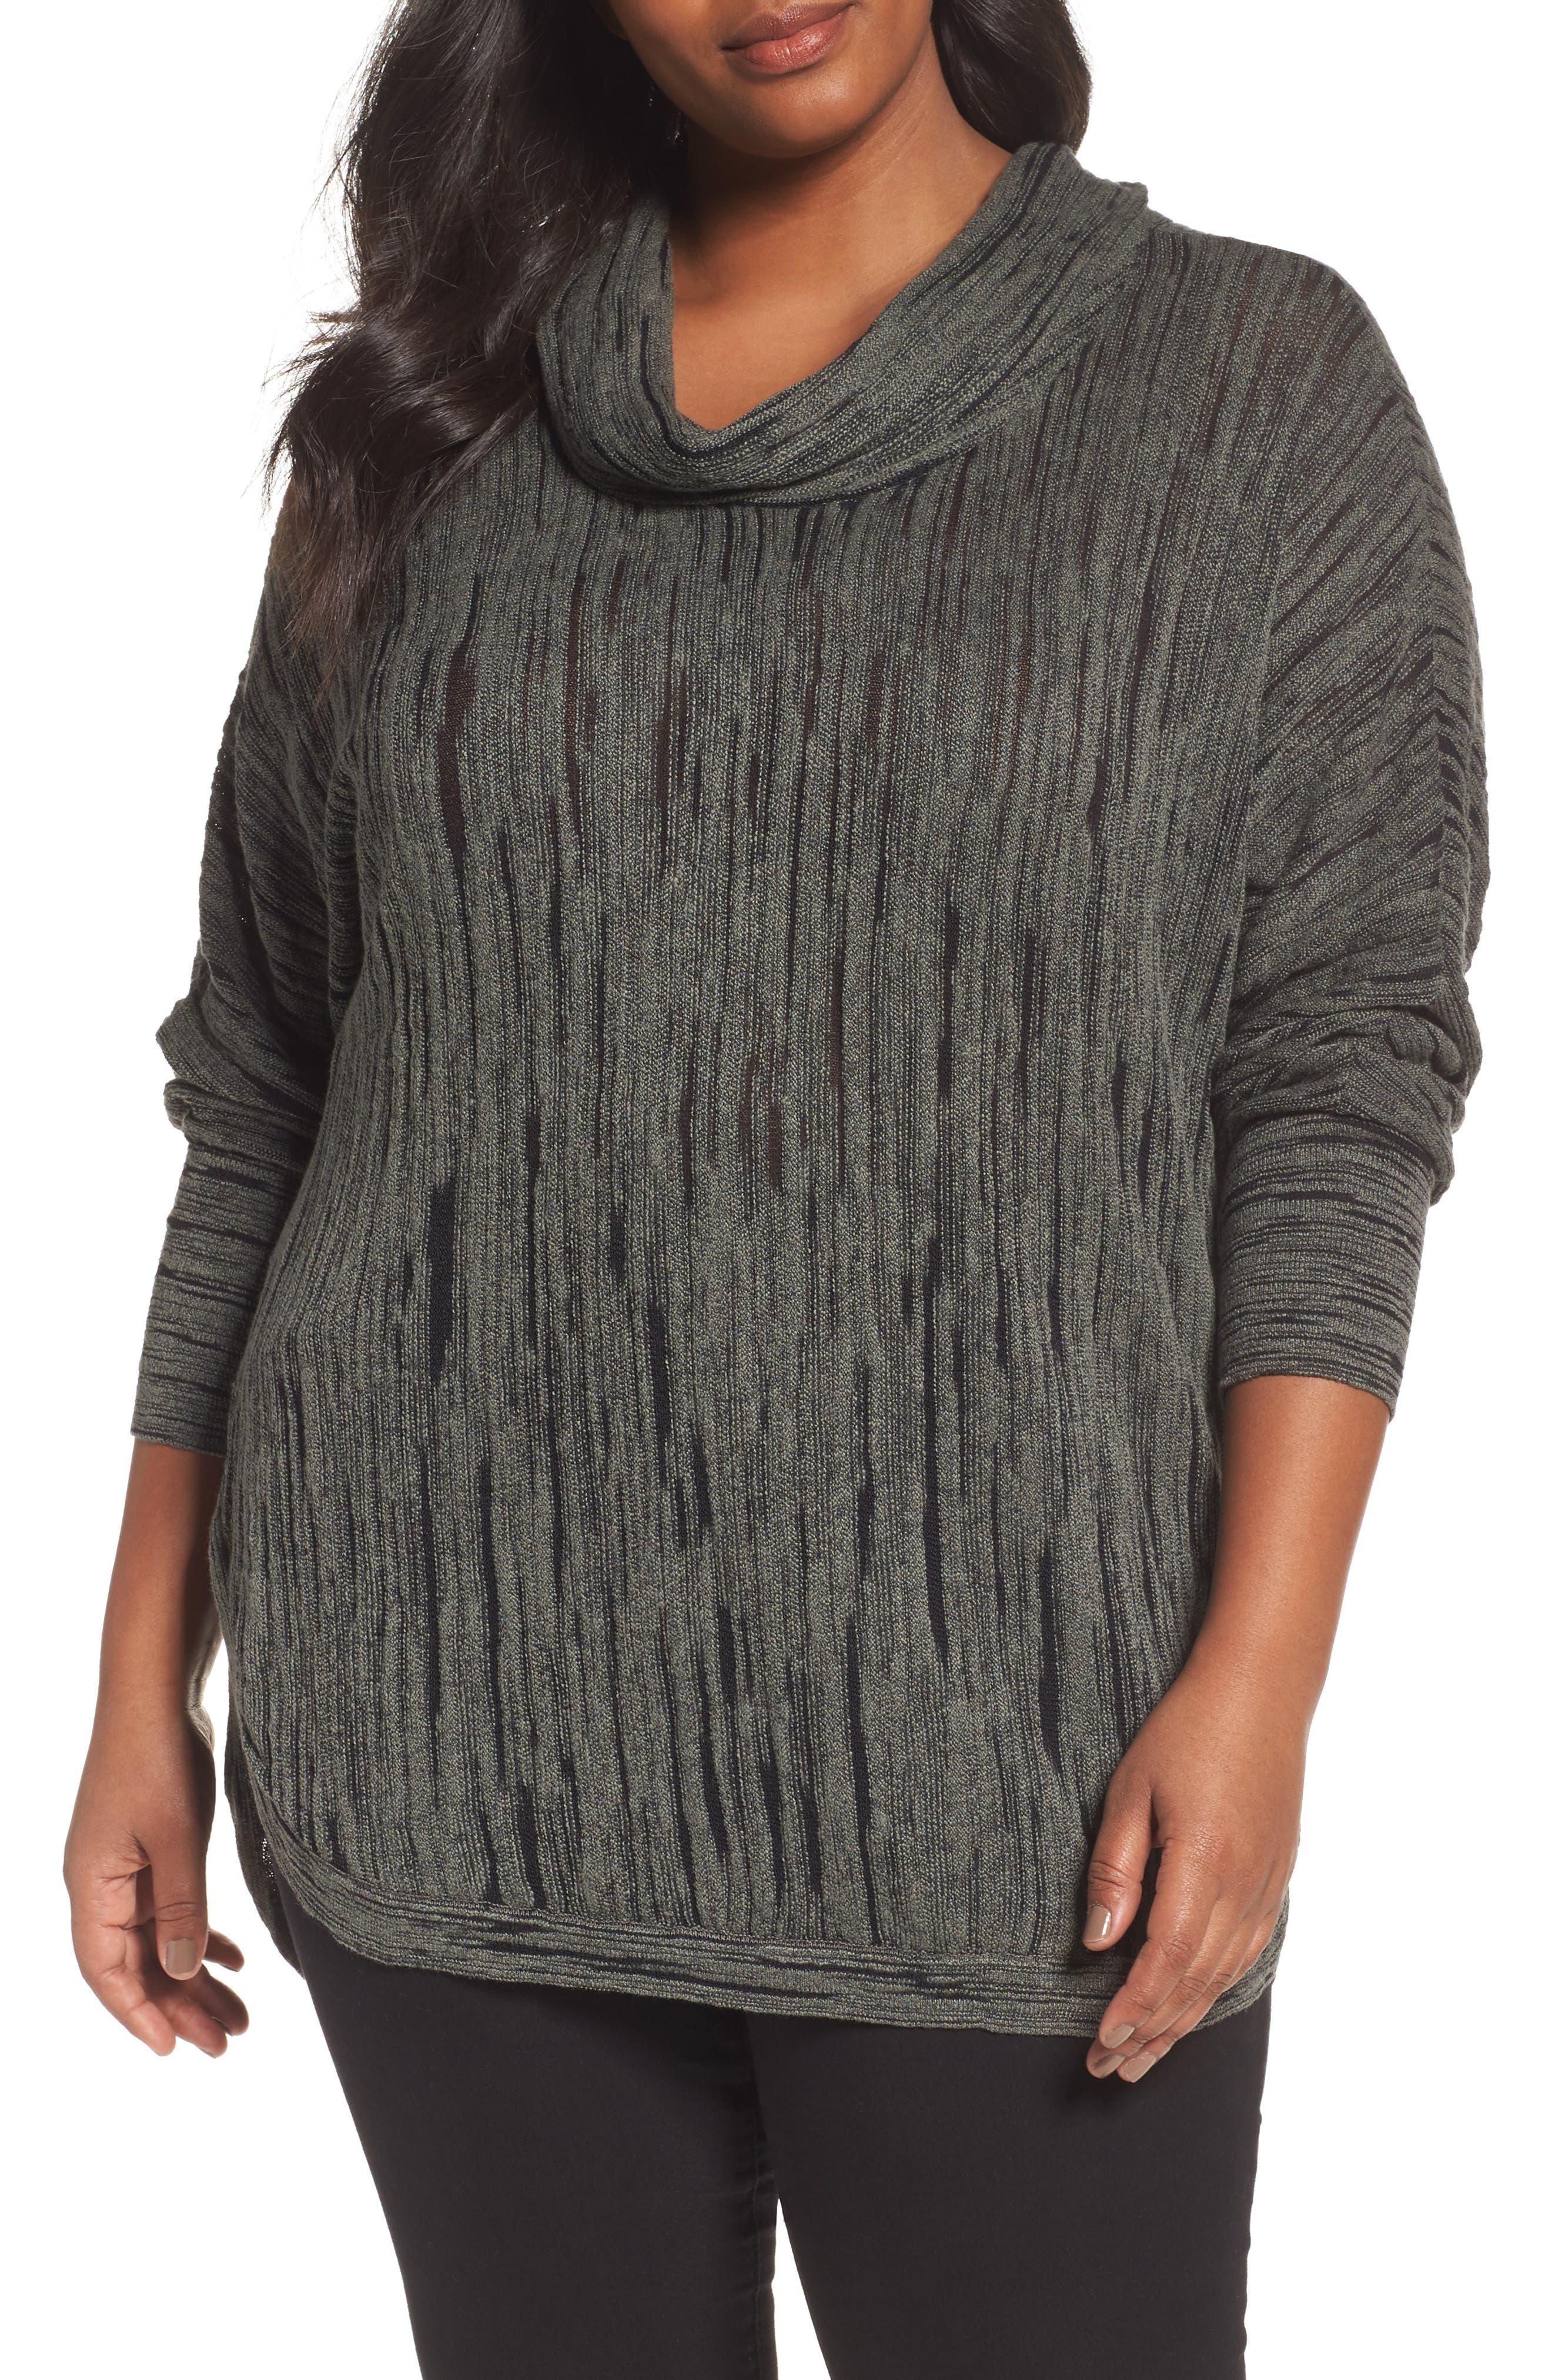 Main Image - NIC+ZOE Cowl Neck Top (Plus Size)